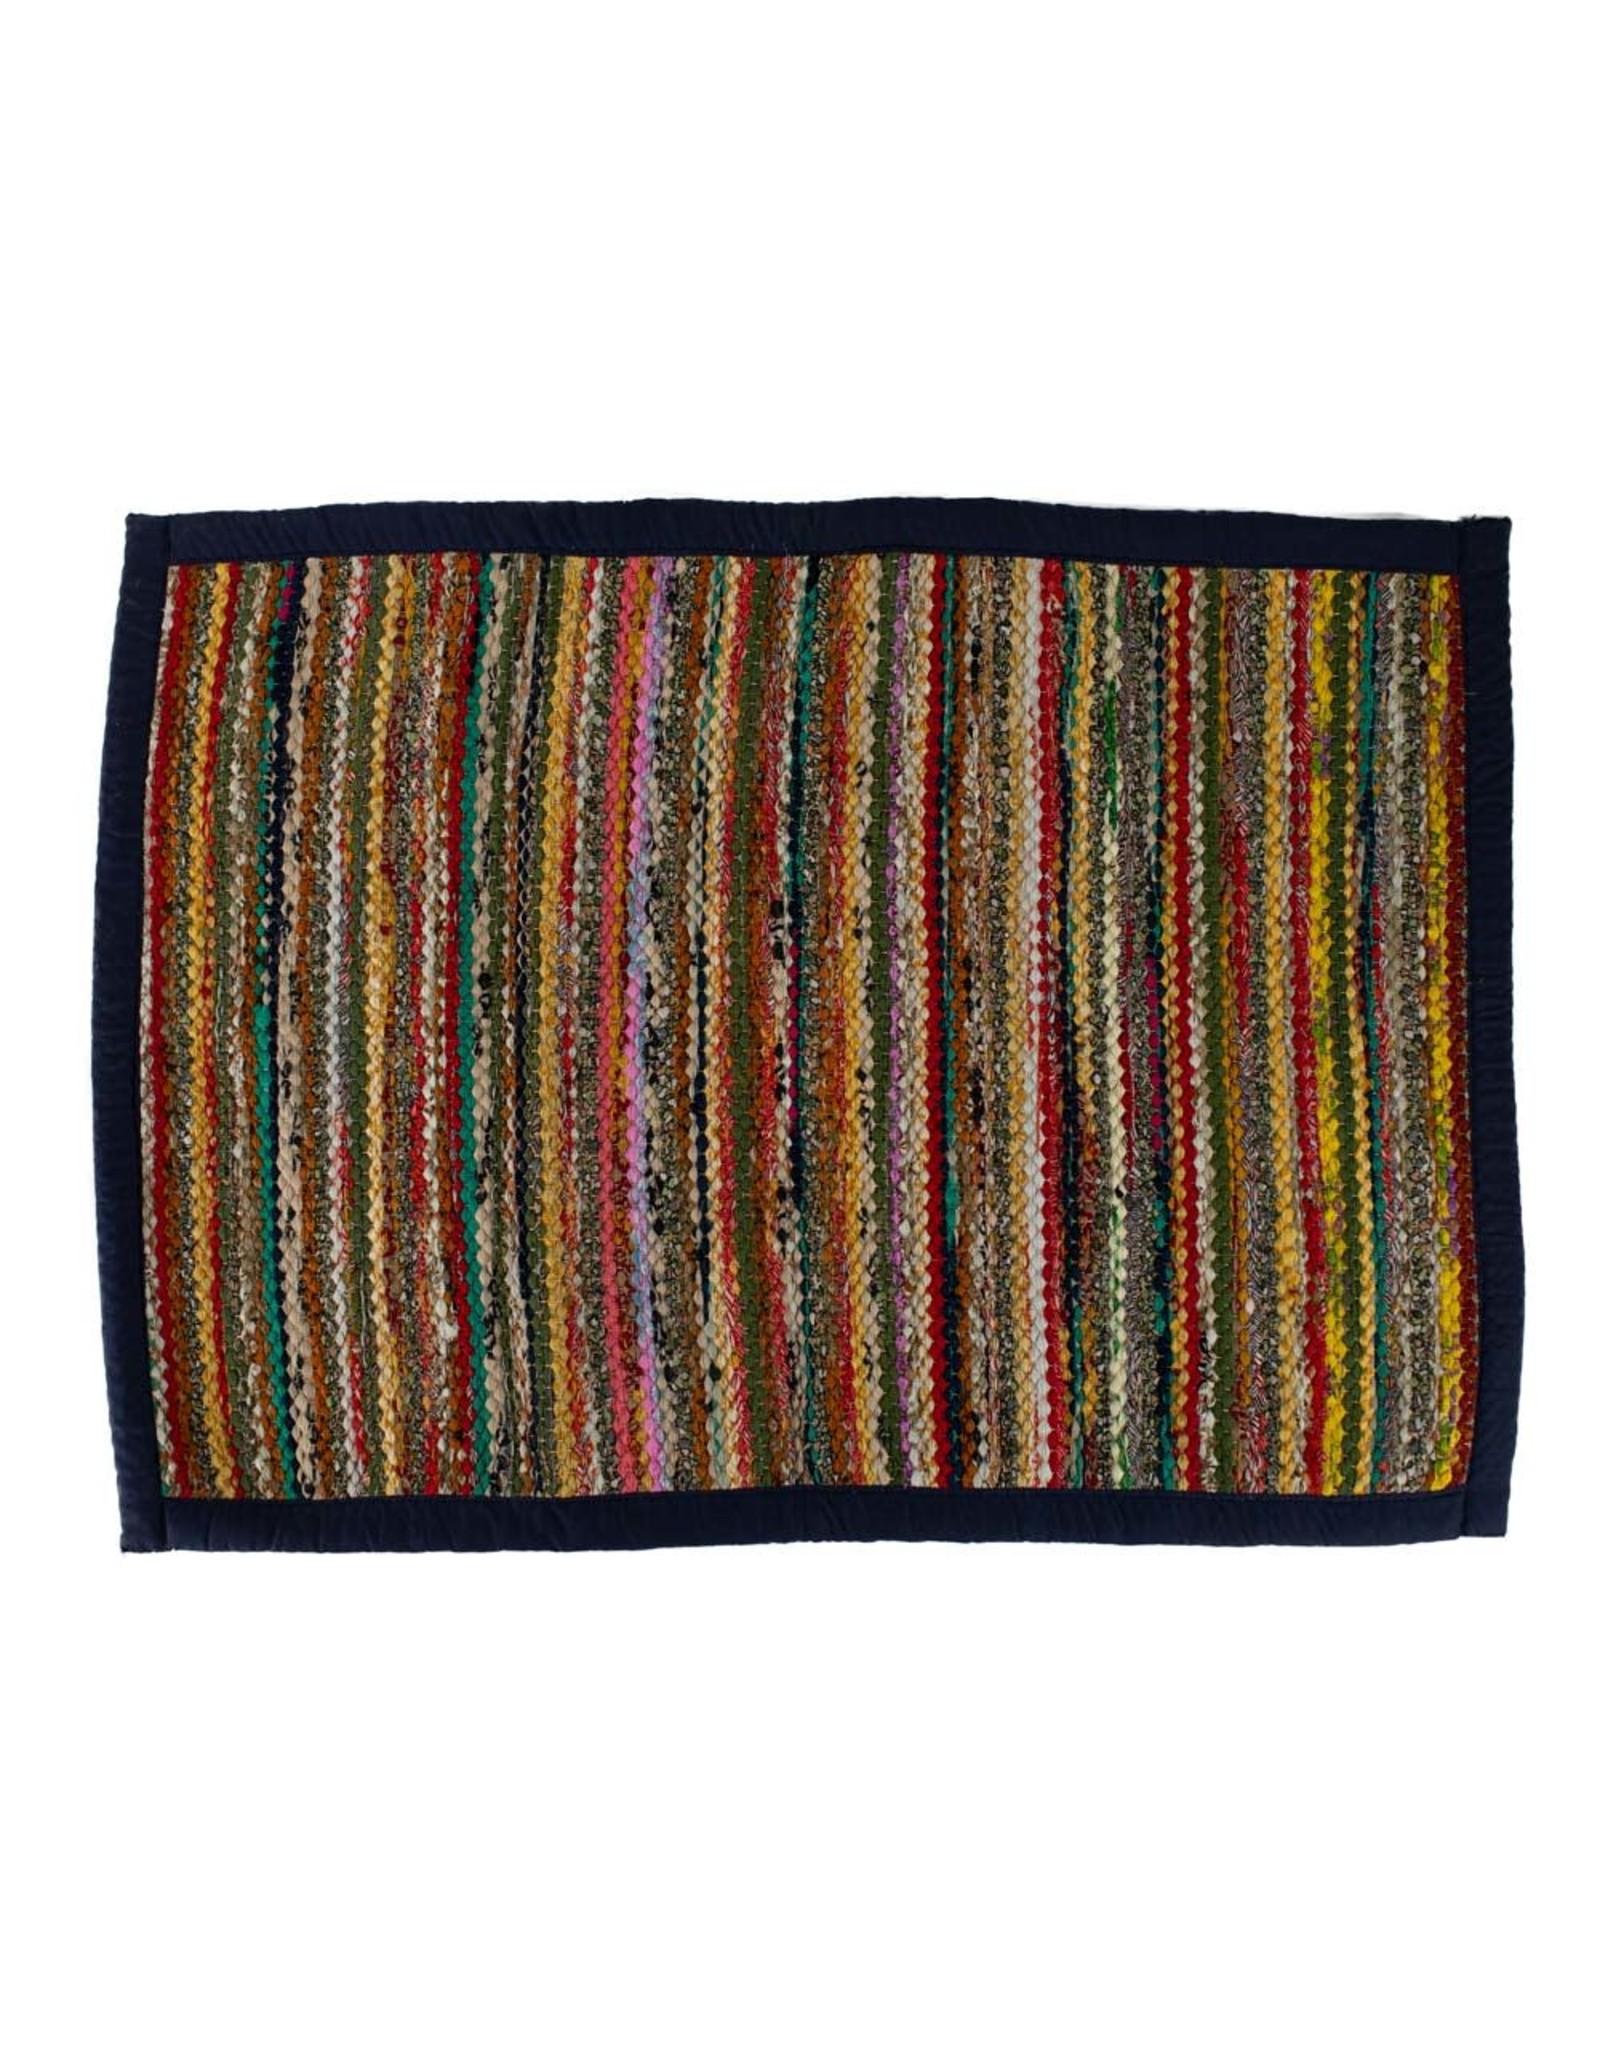 TTV USA Recycled Sari Rug, India